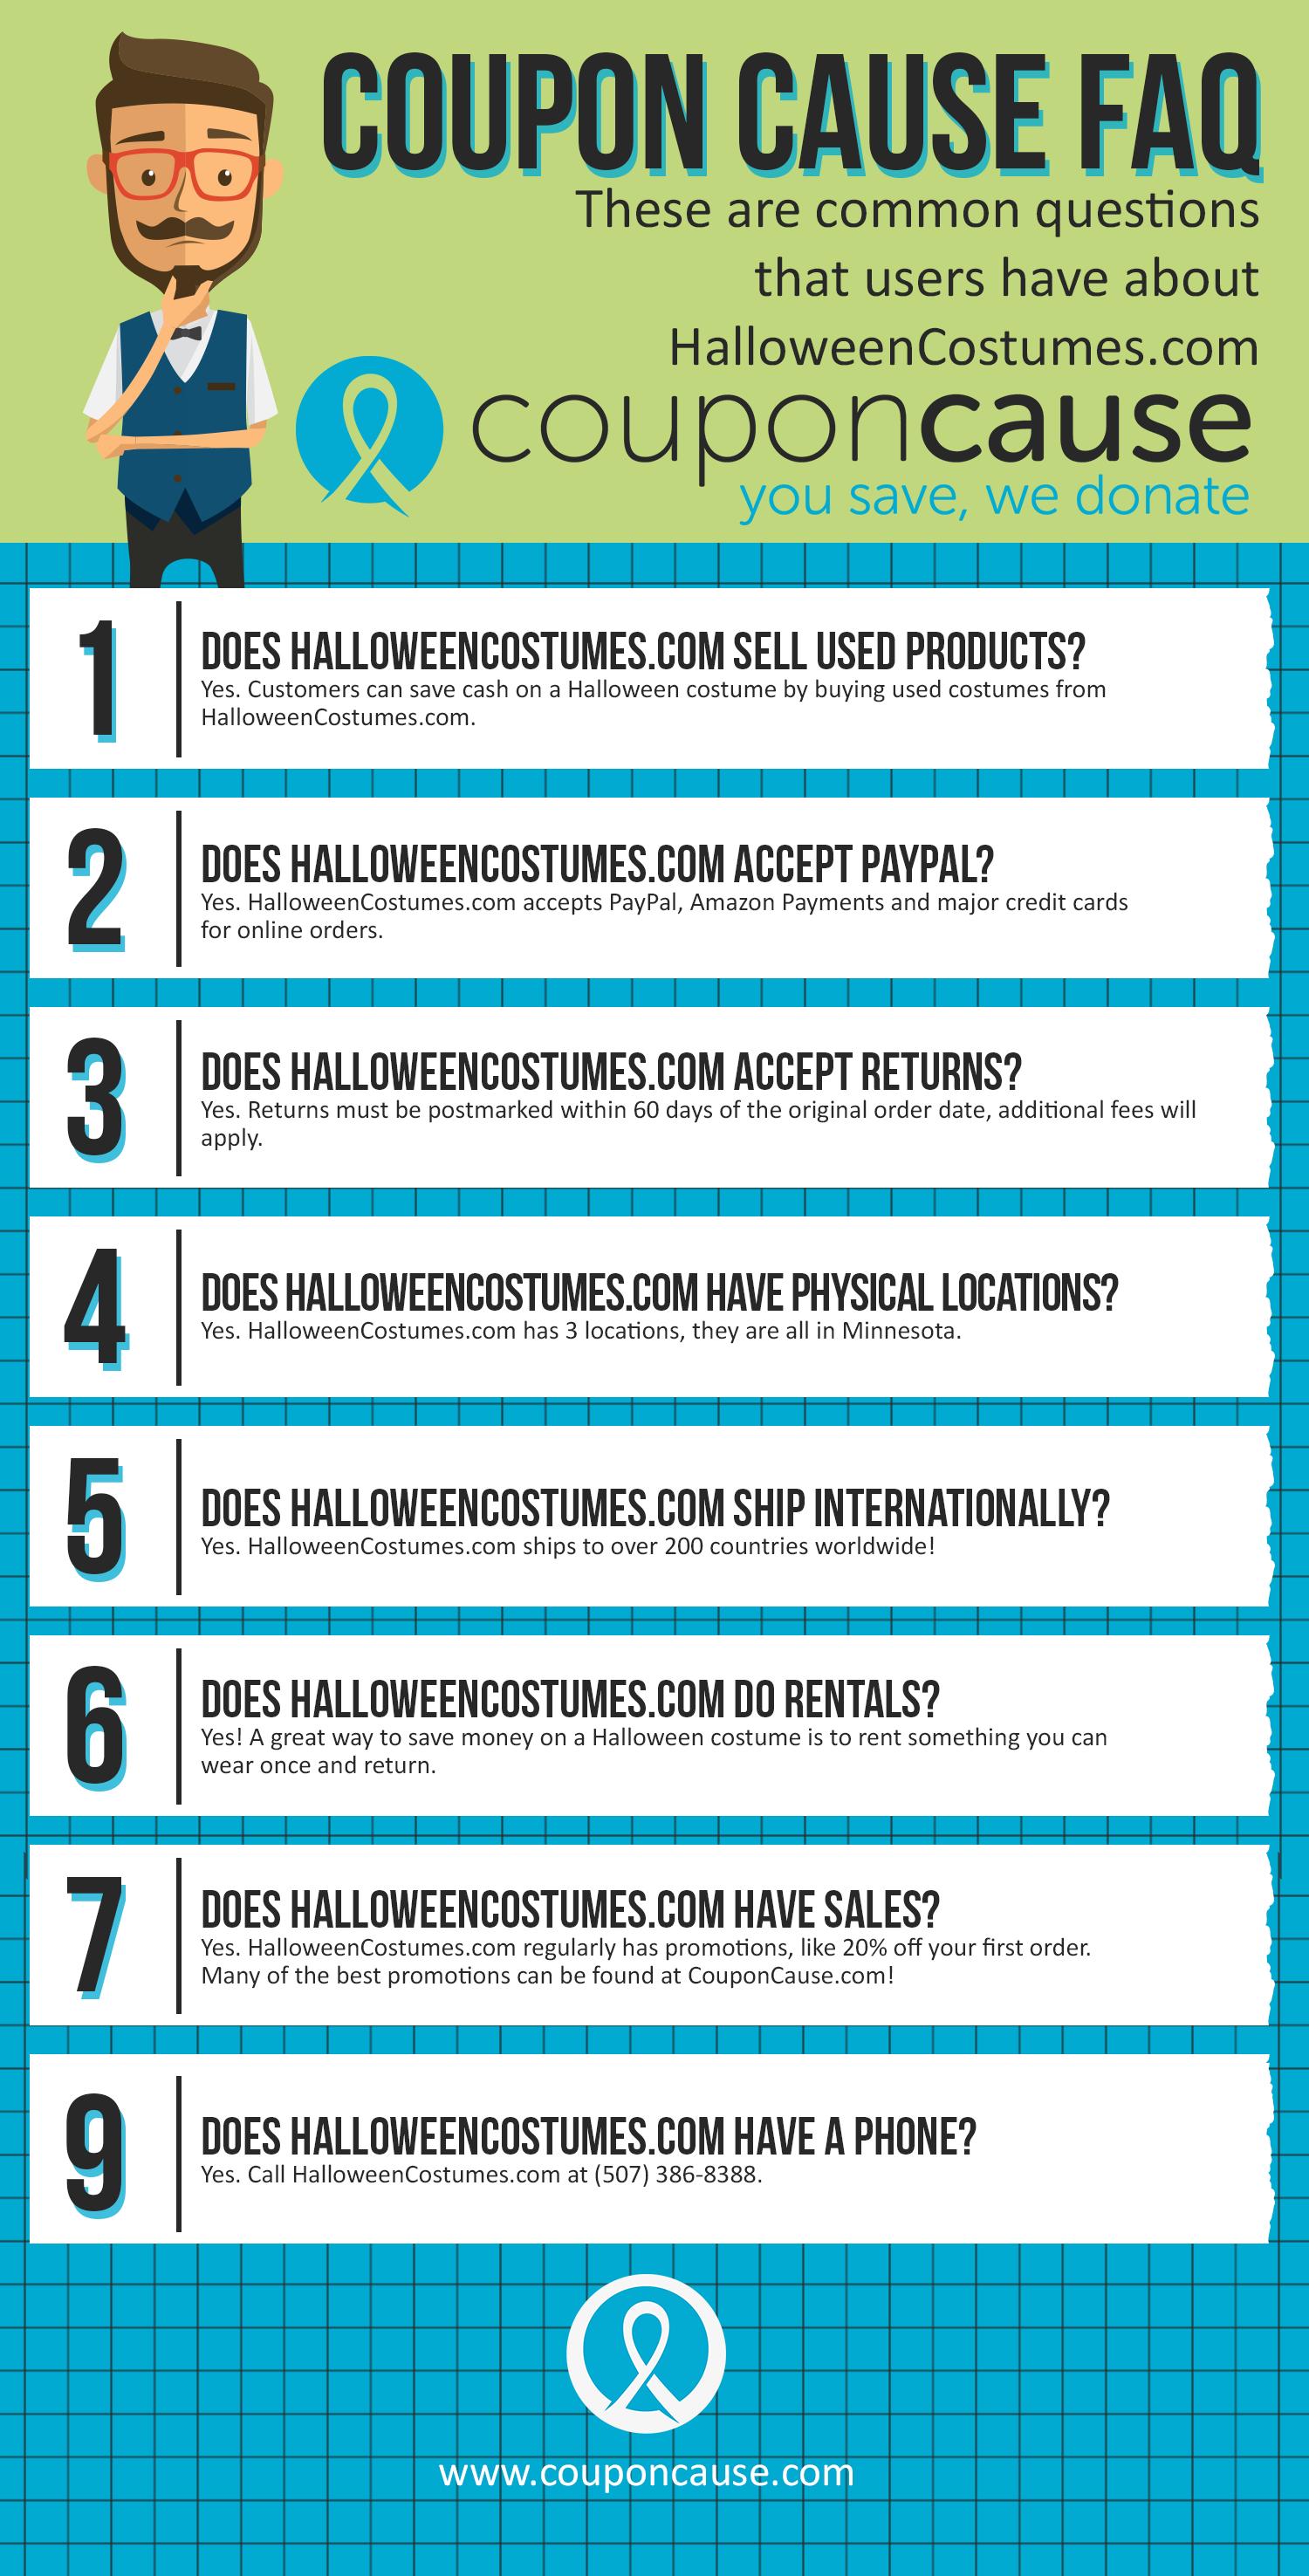 halloweencostumes-com-coupons-infographic